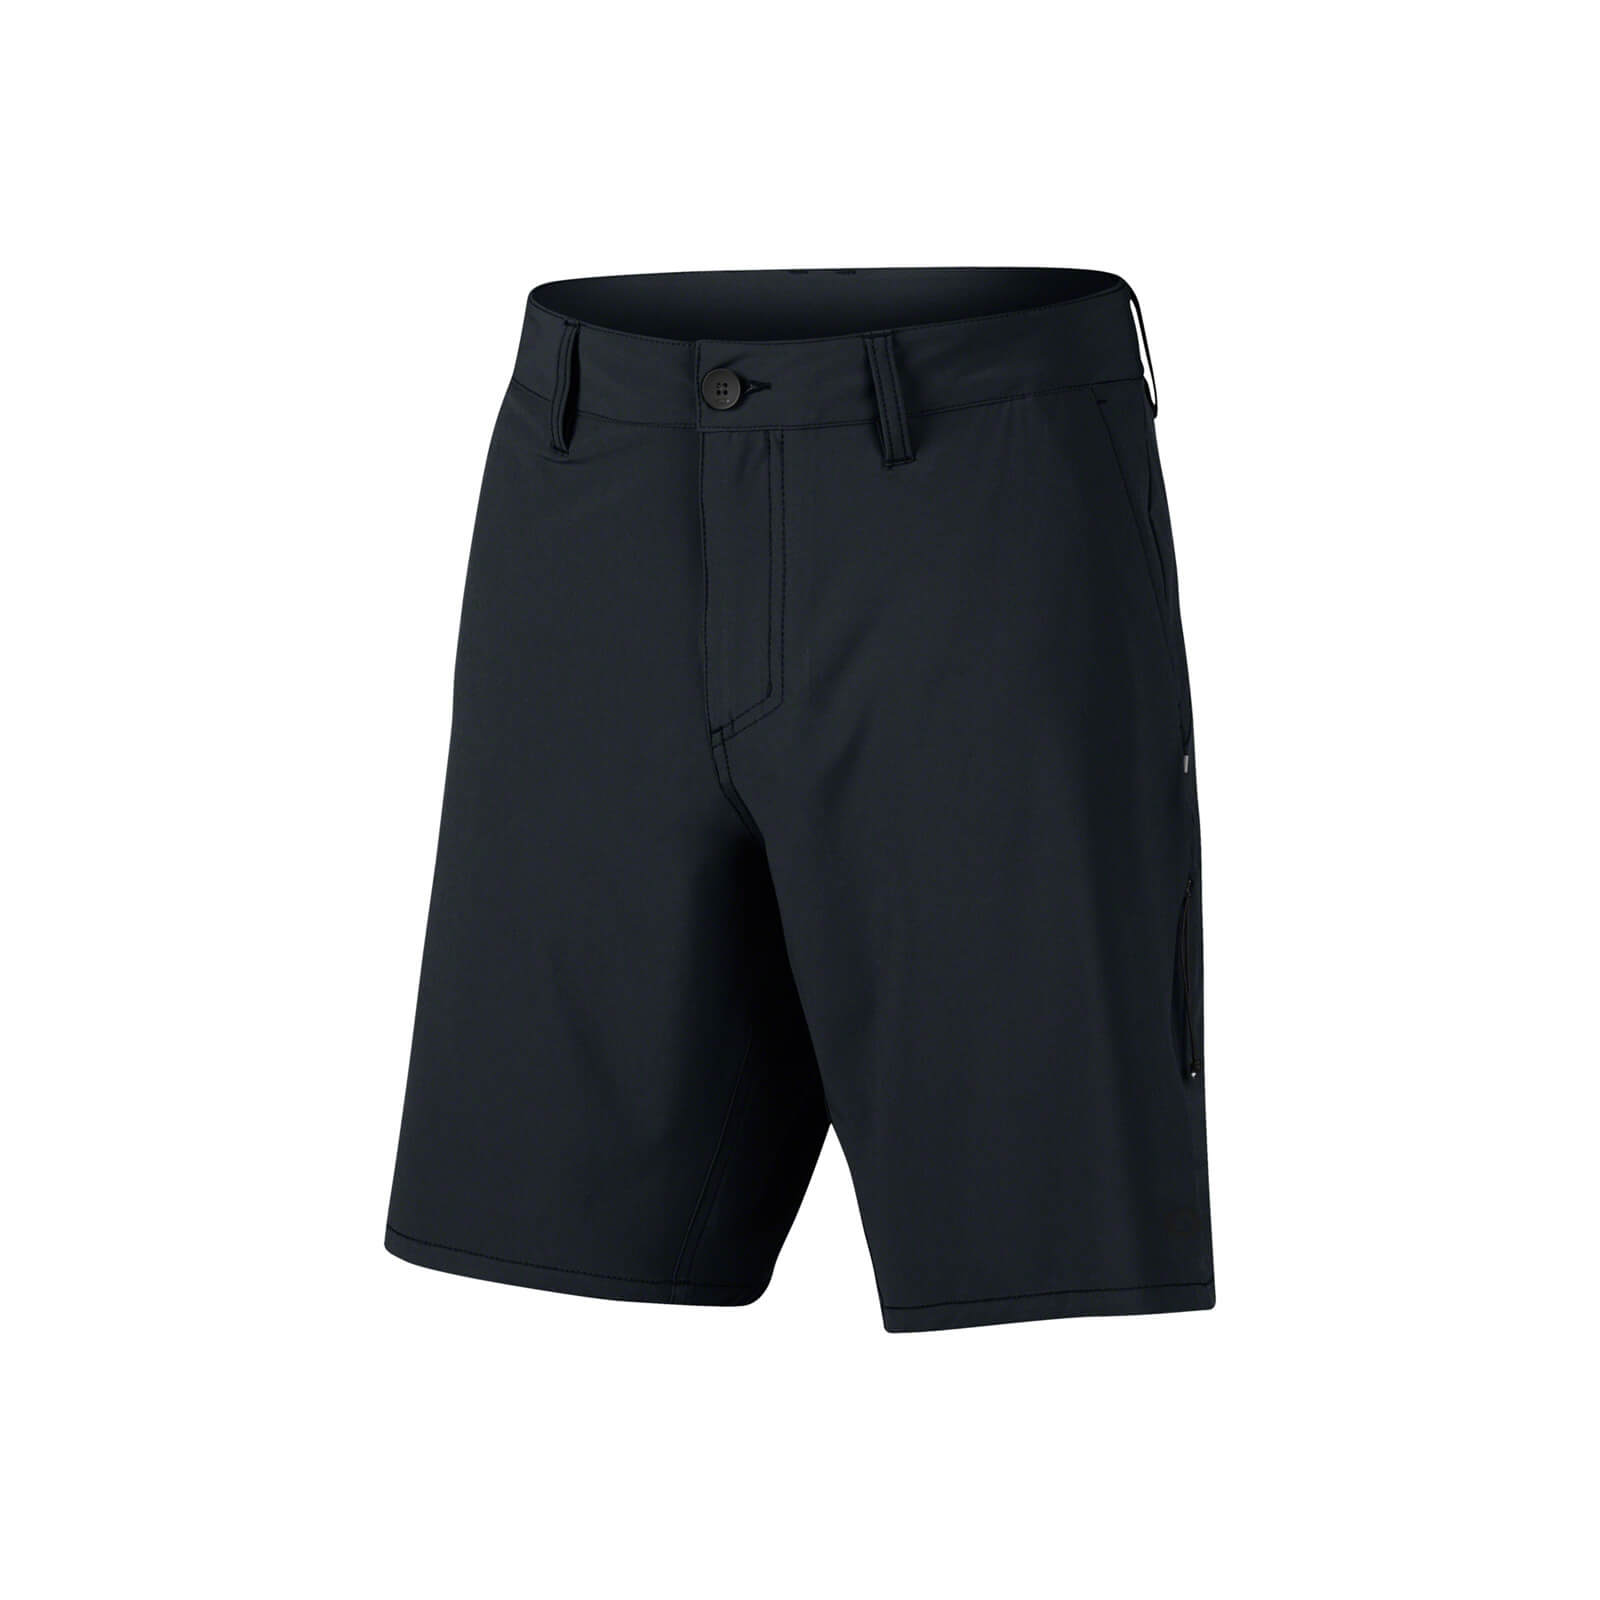 2890a3ba6e2 Oakley Men s Link Hybrid 20 Shorts - Black